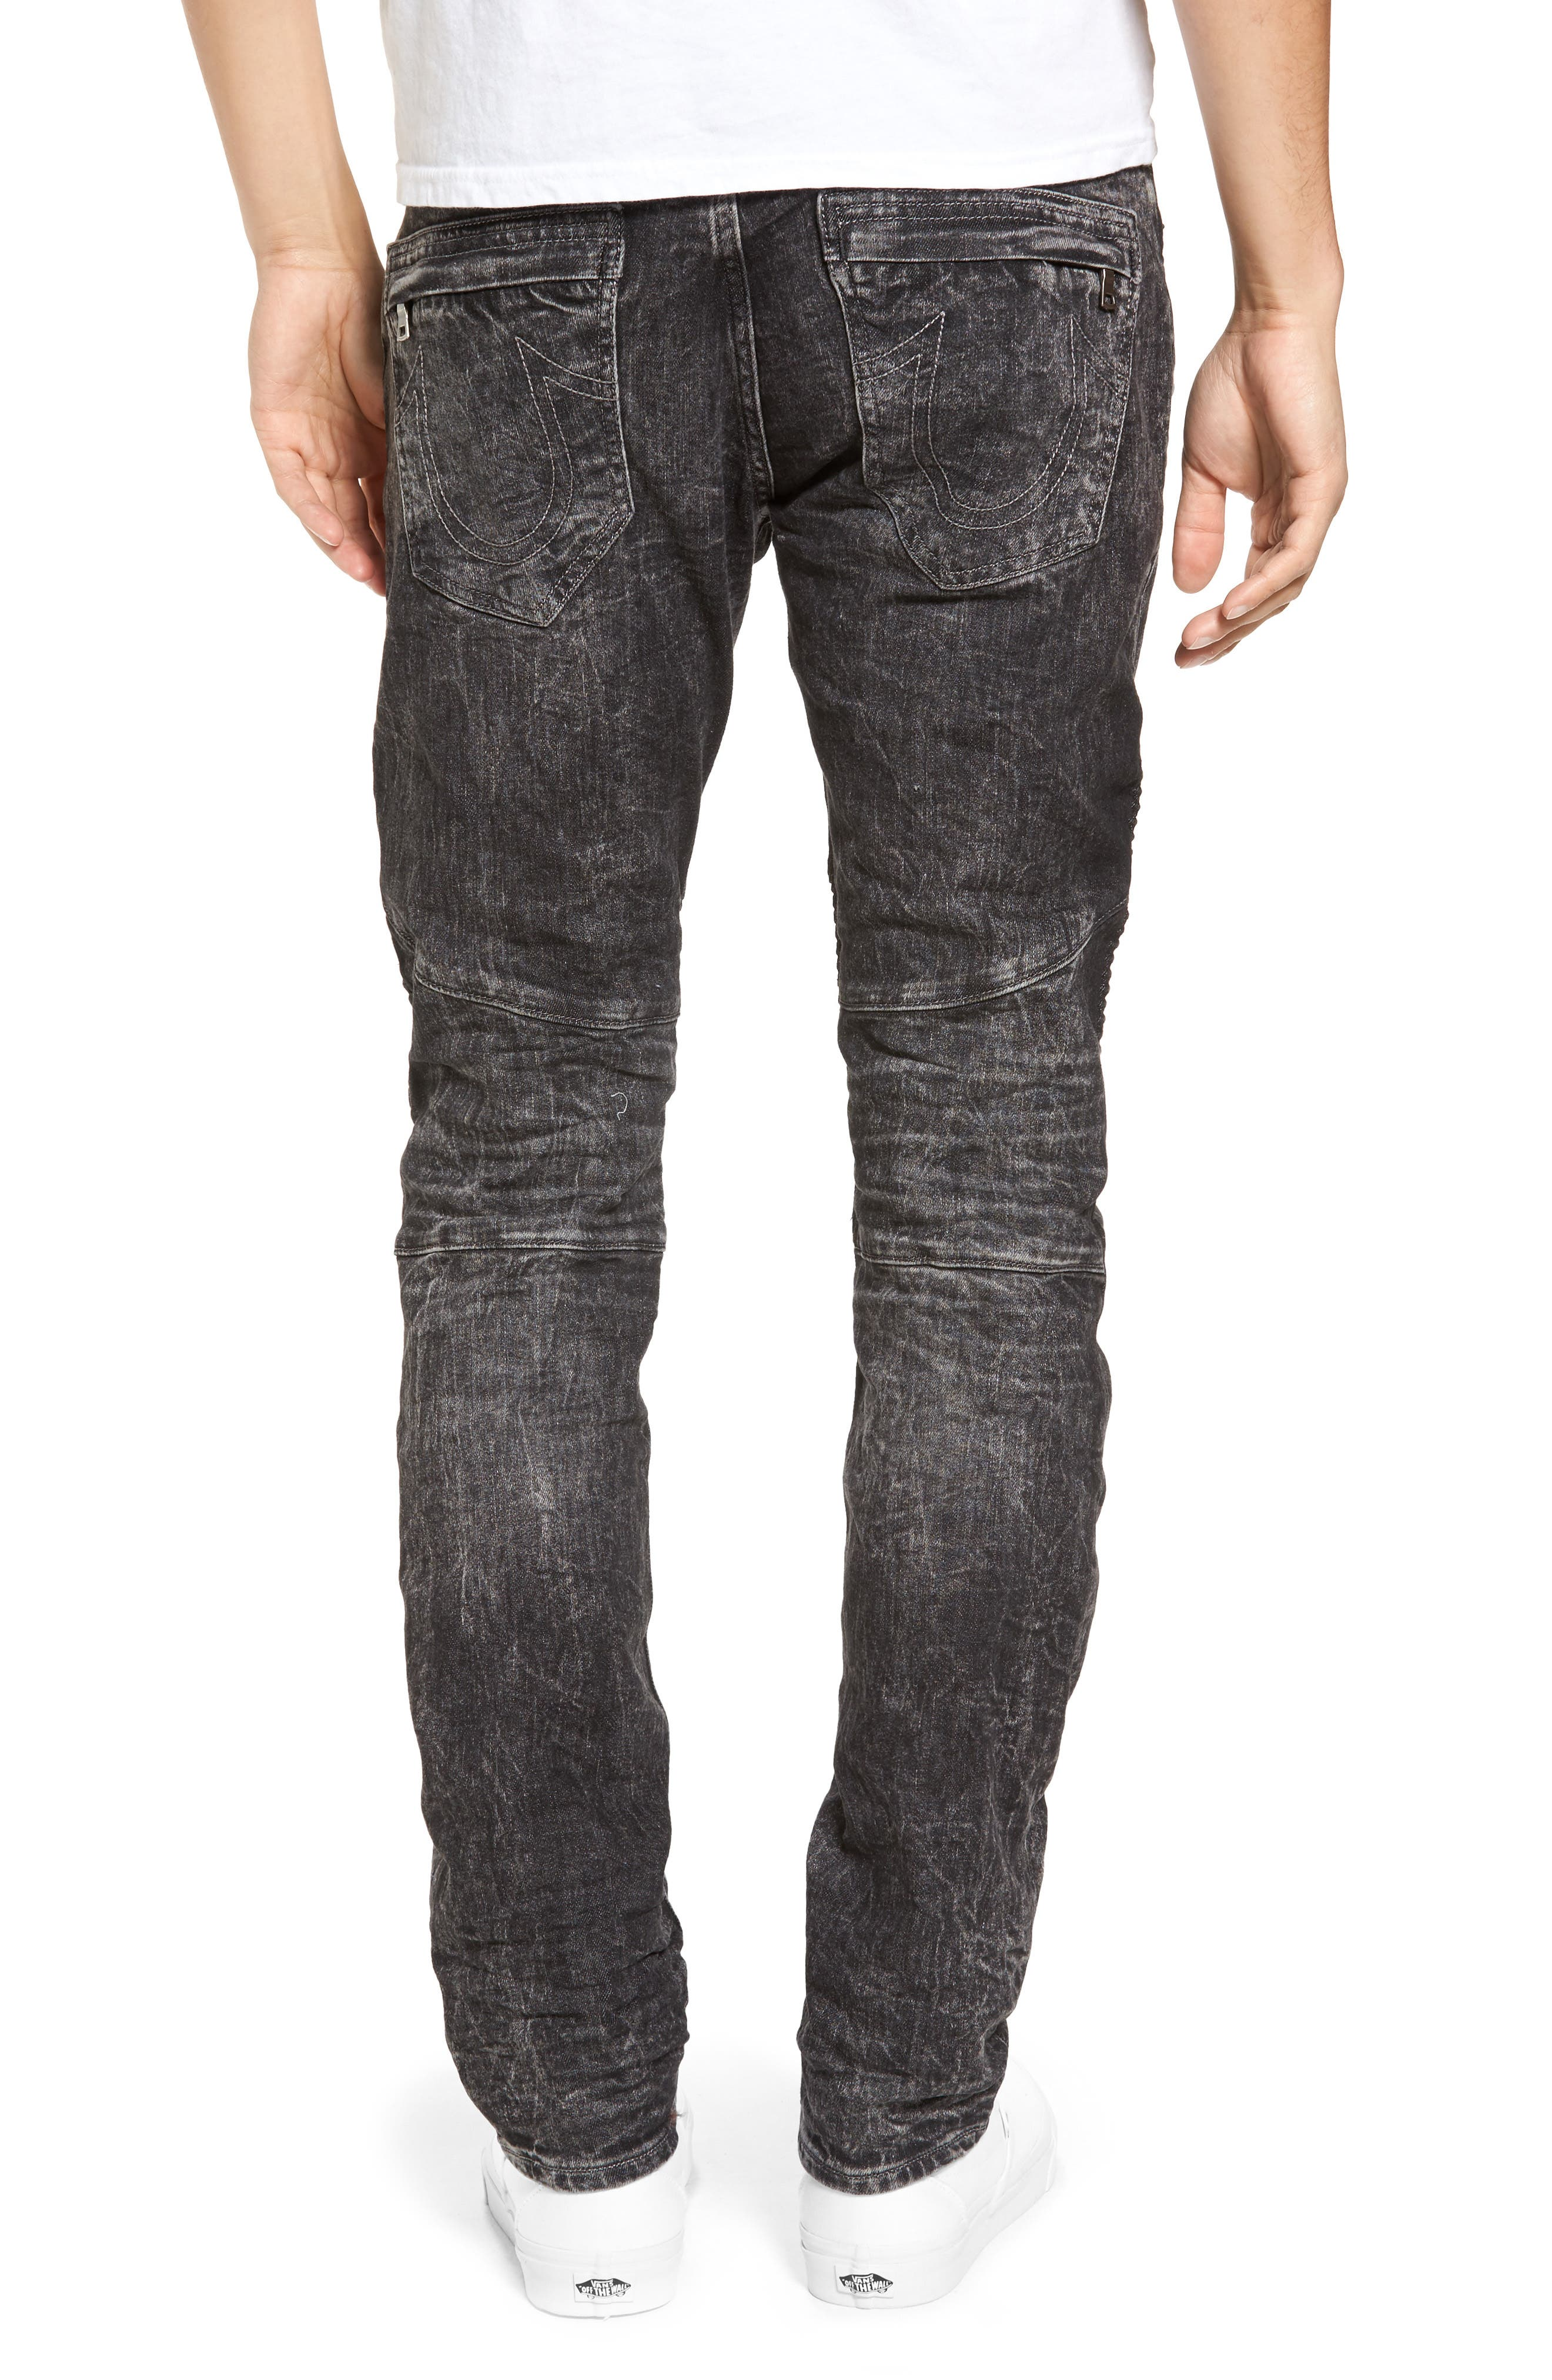 Rocco Skinny Fit Jeans,                             Alternate thumbnail 3, color,                             Dark Raven